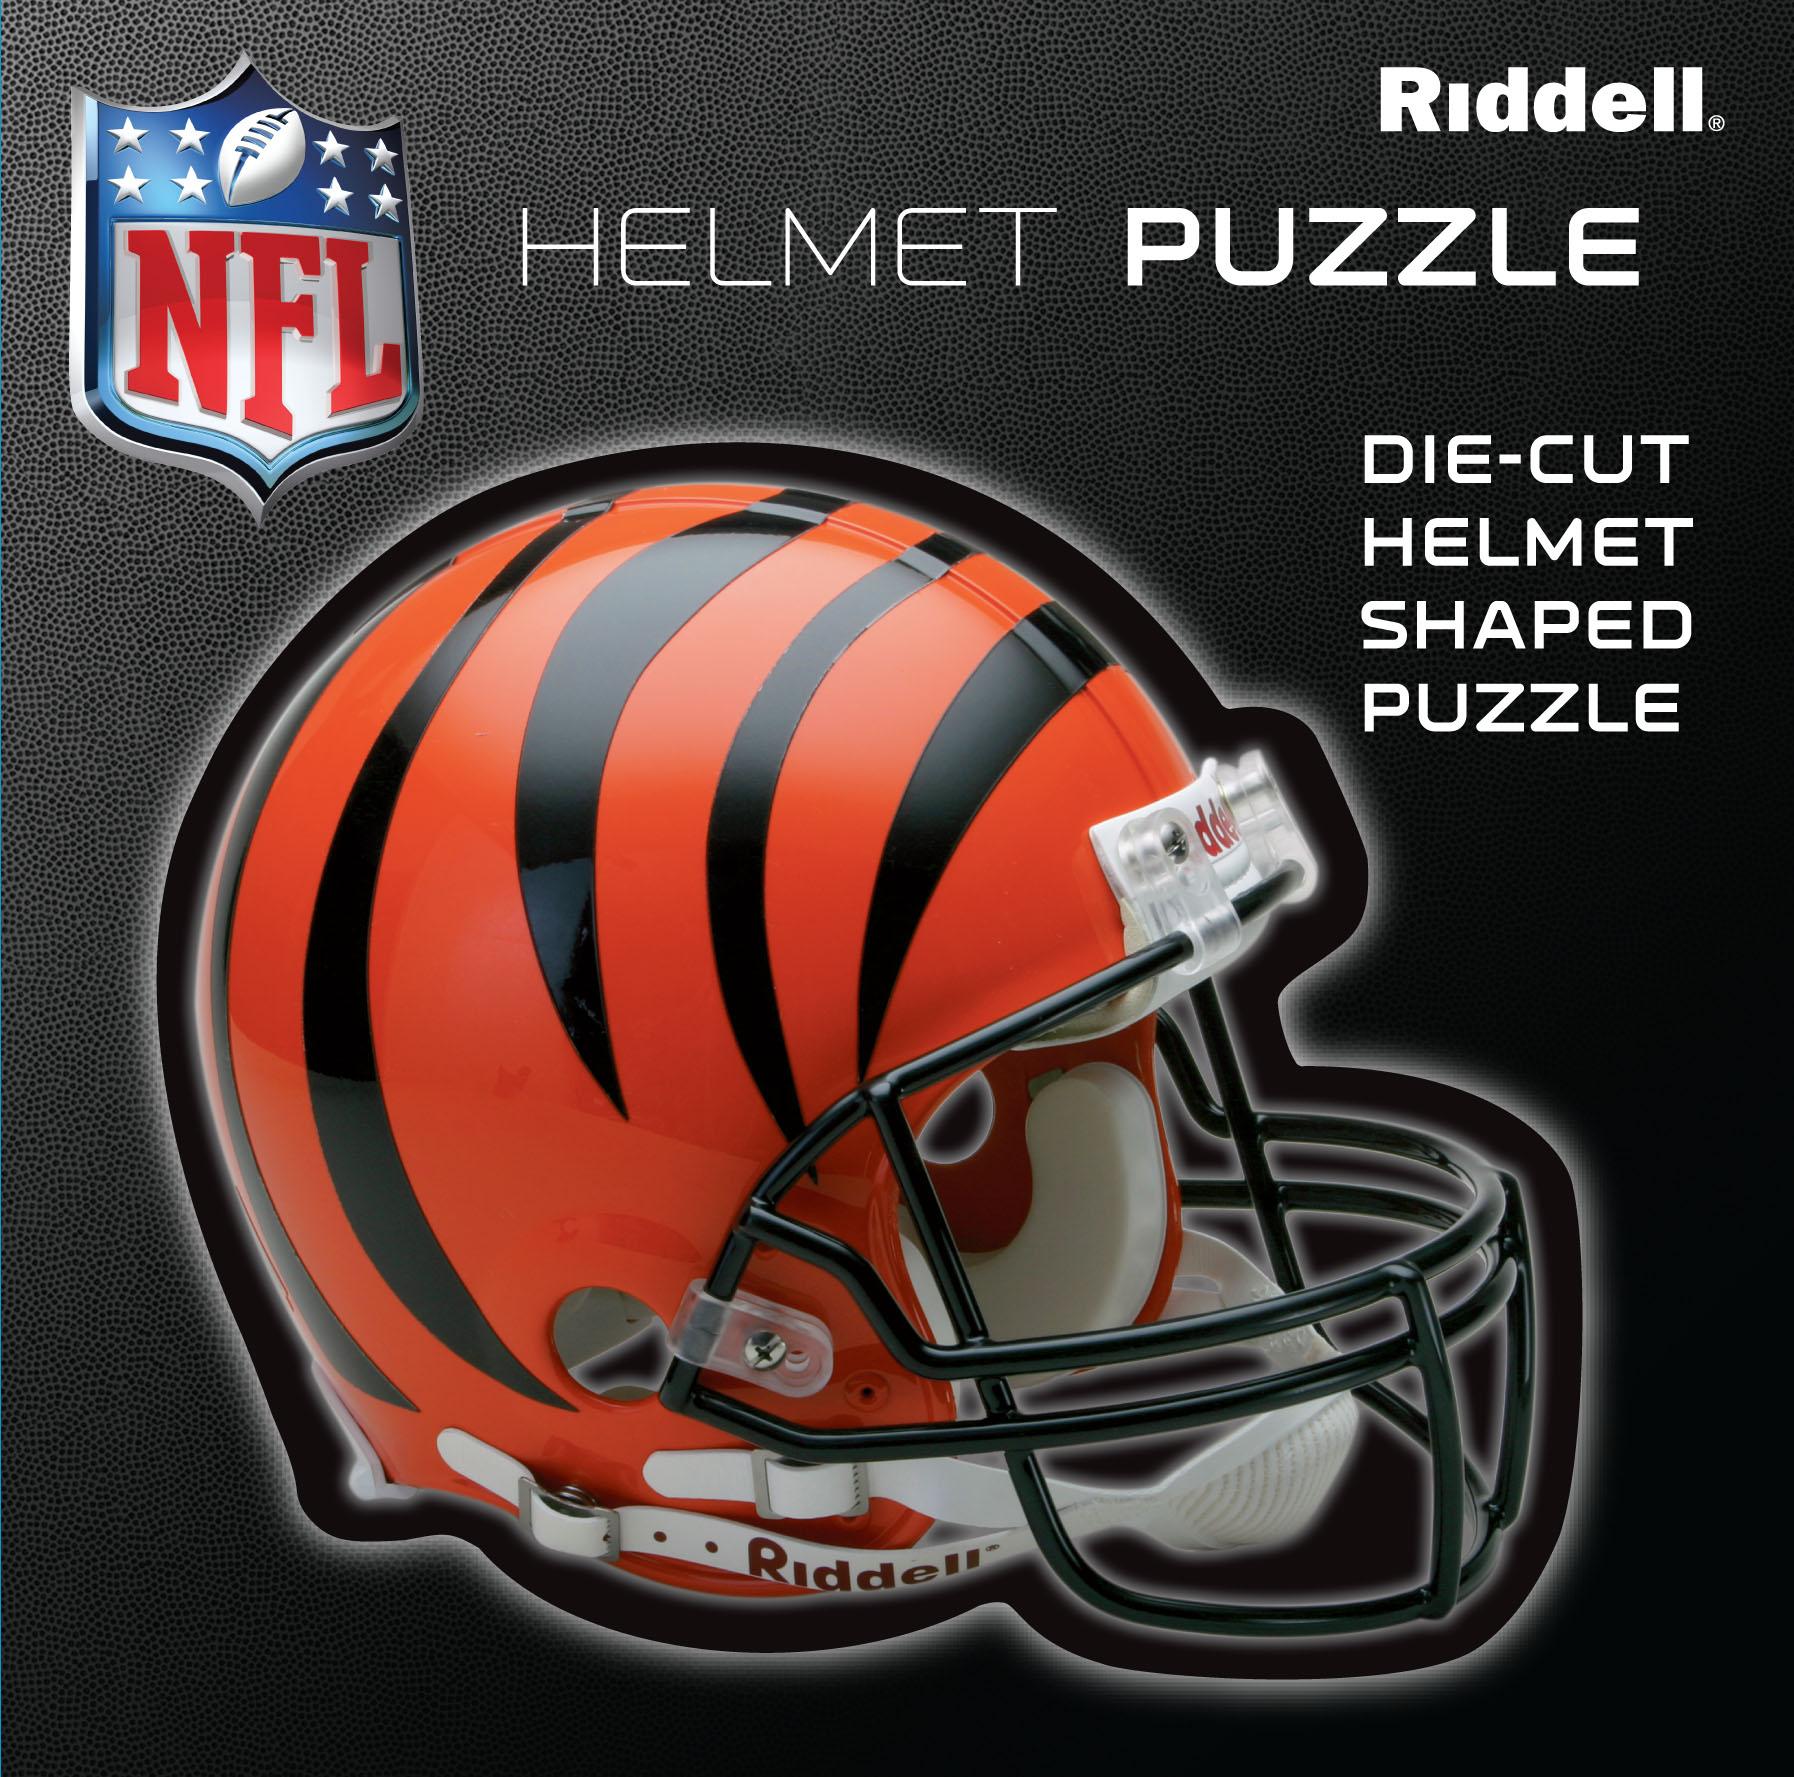 Cincinnati Bengals Helmet Puzzle 100 Pieces Riddell